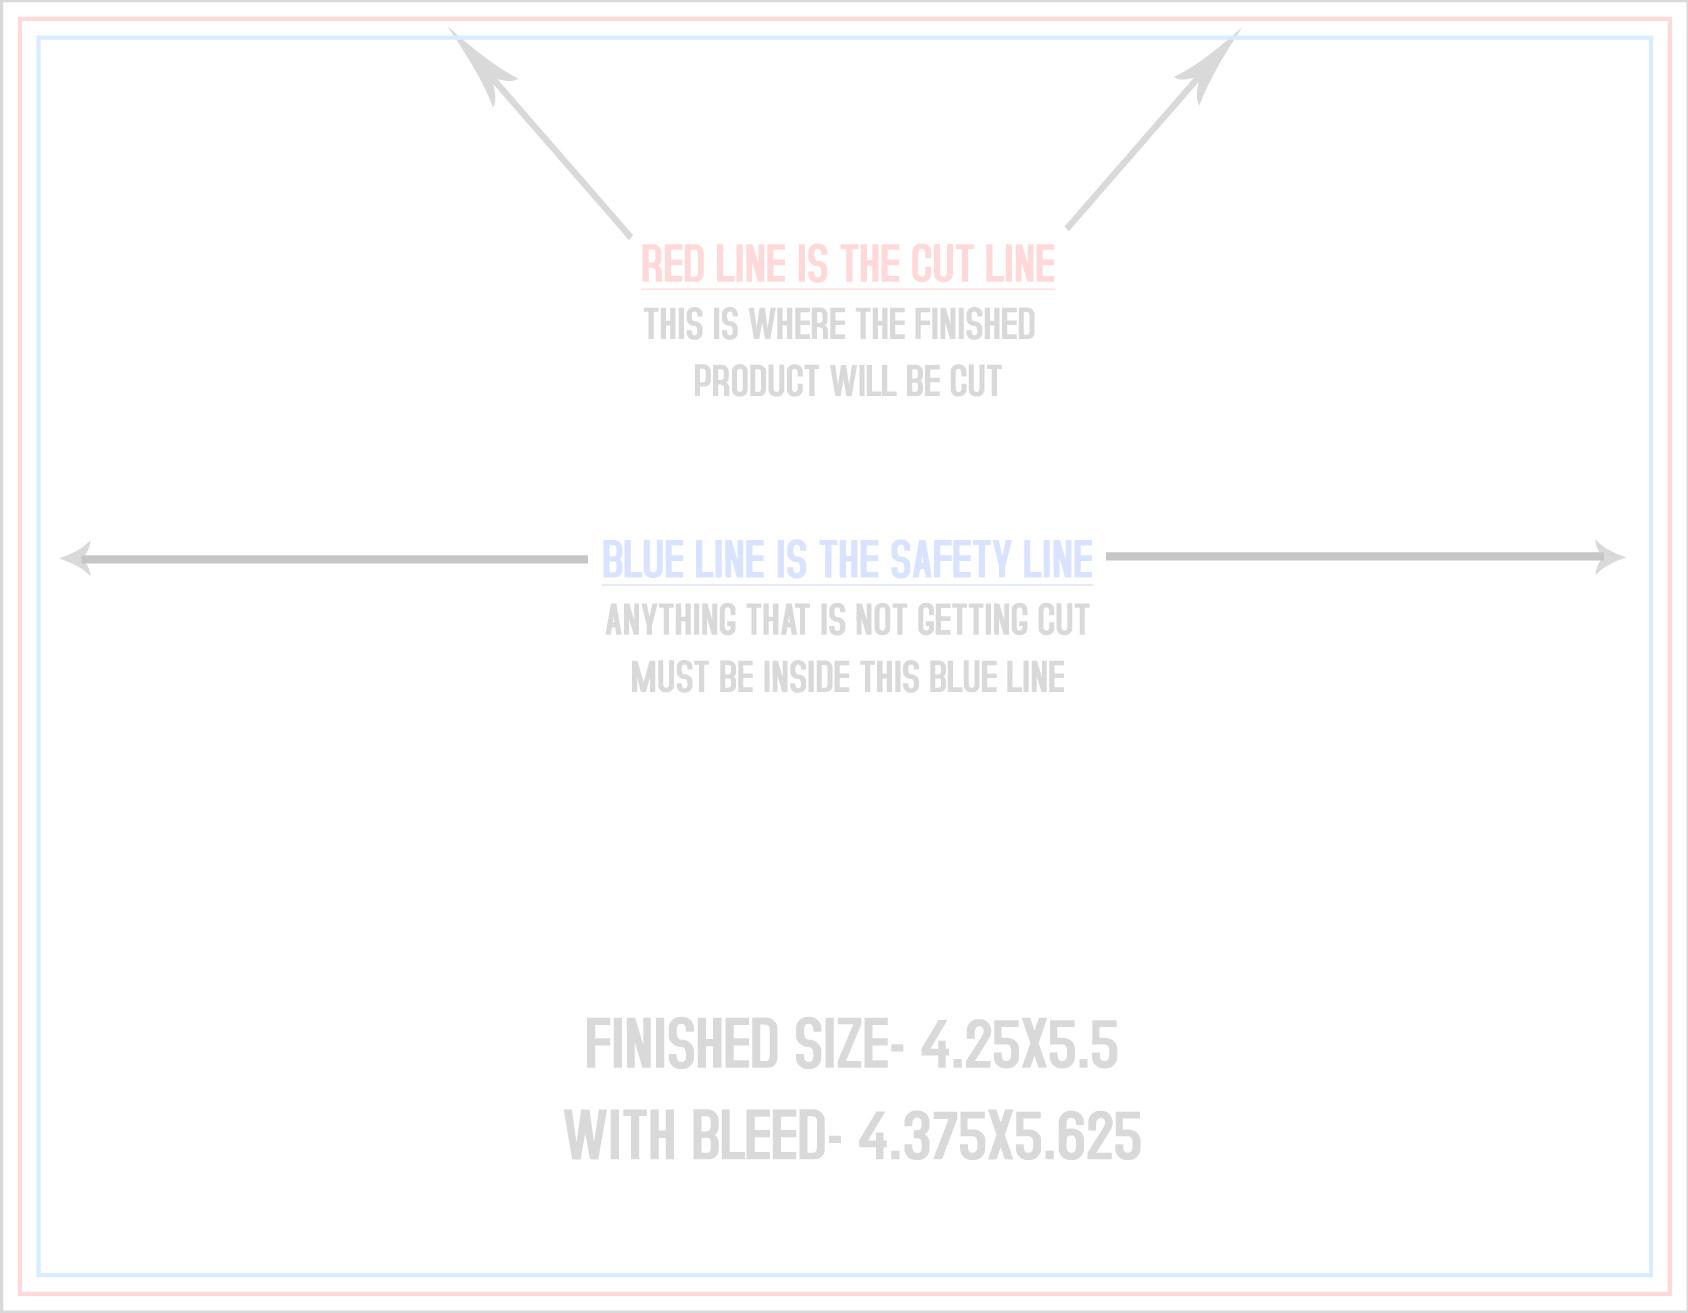 Pt Full Color Flyers Cheap Color Flyers Custom Flyers Flyer - 6x9 postcard template